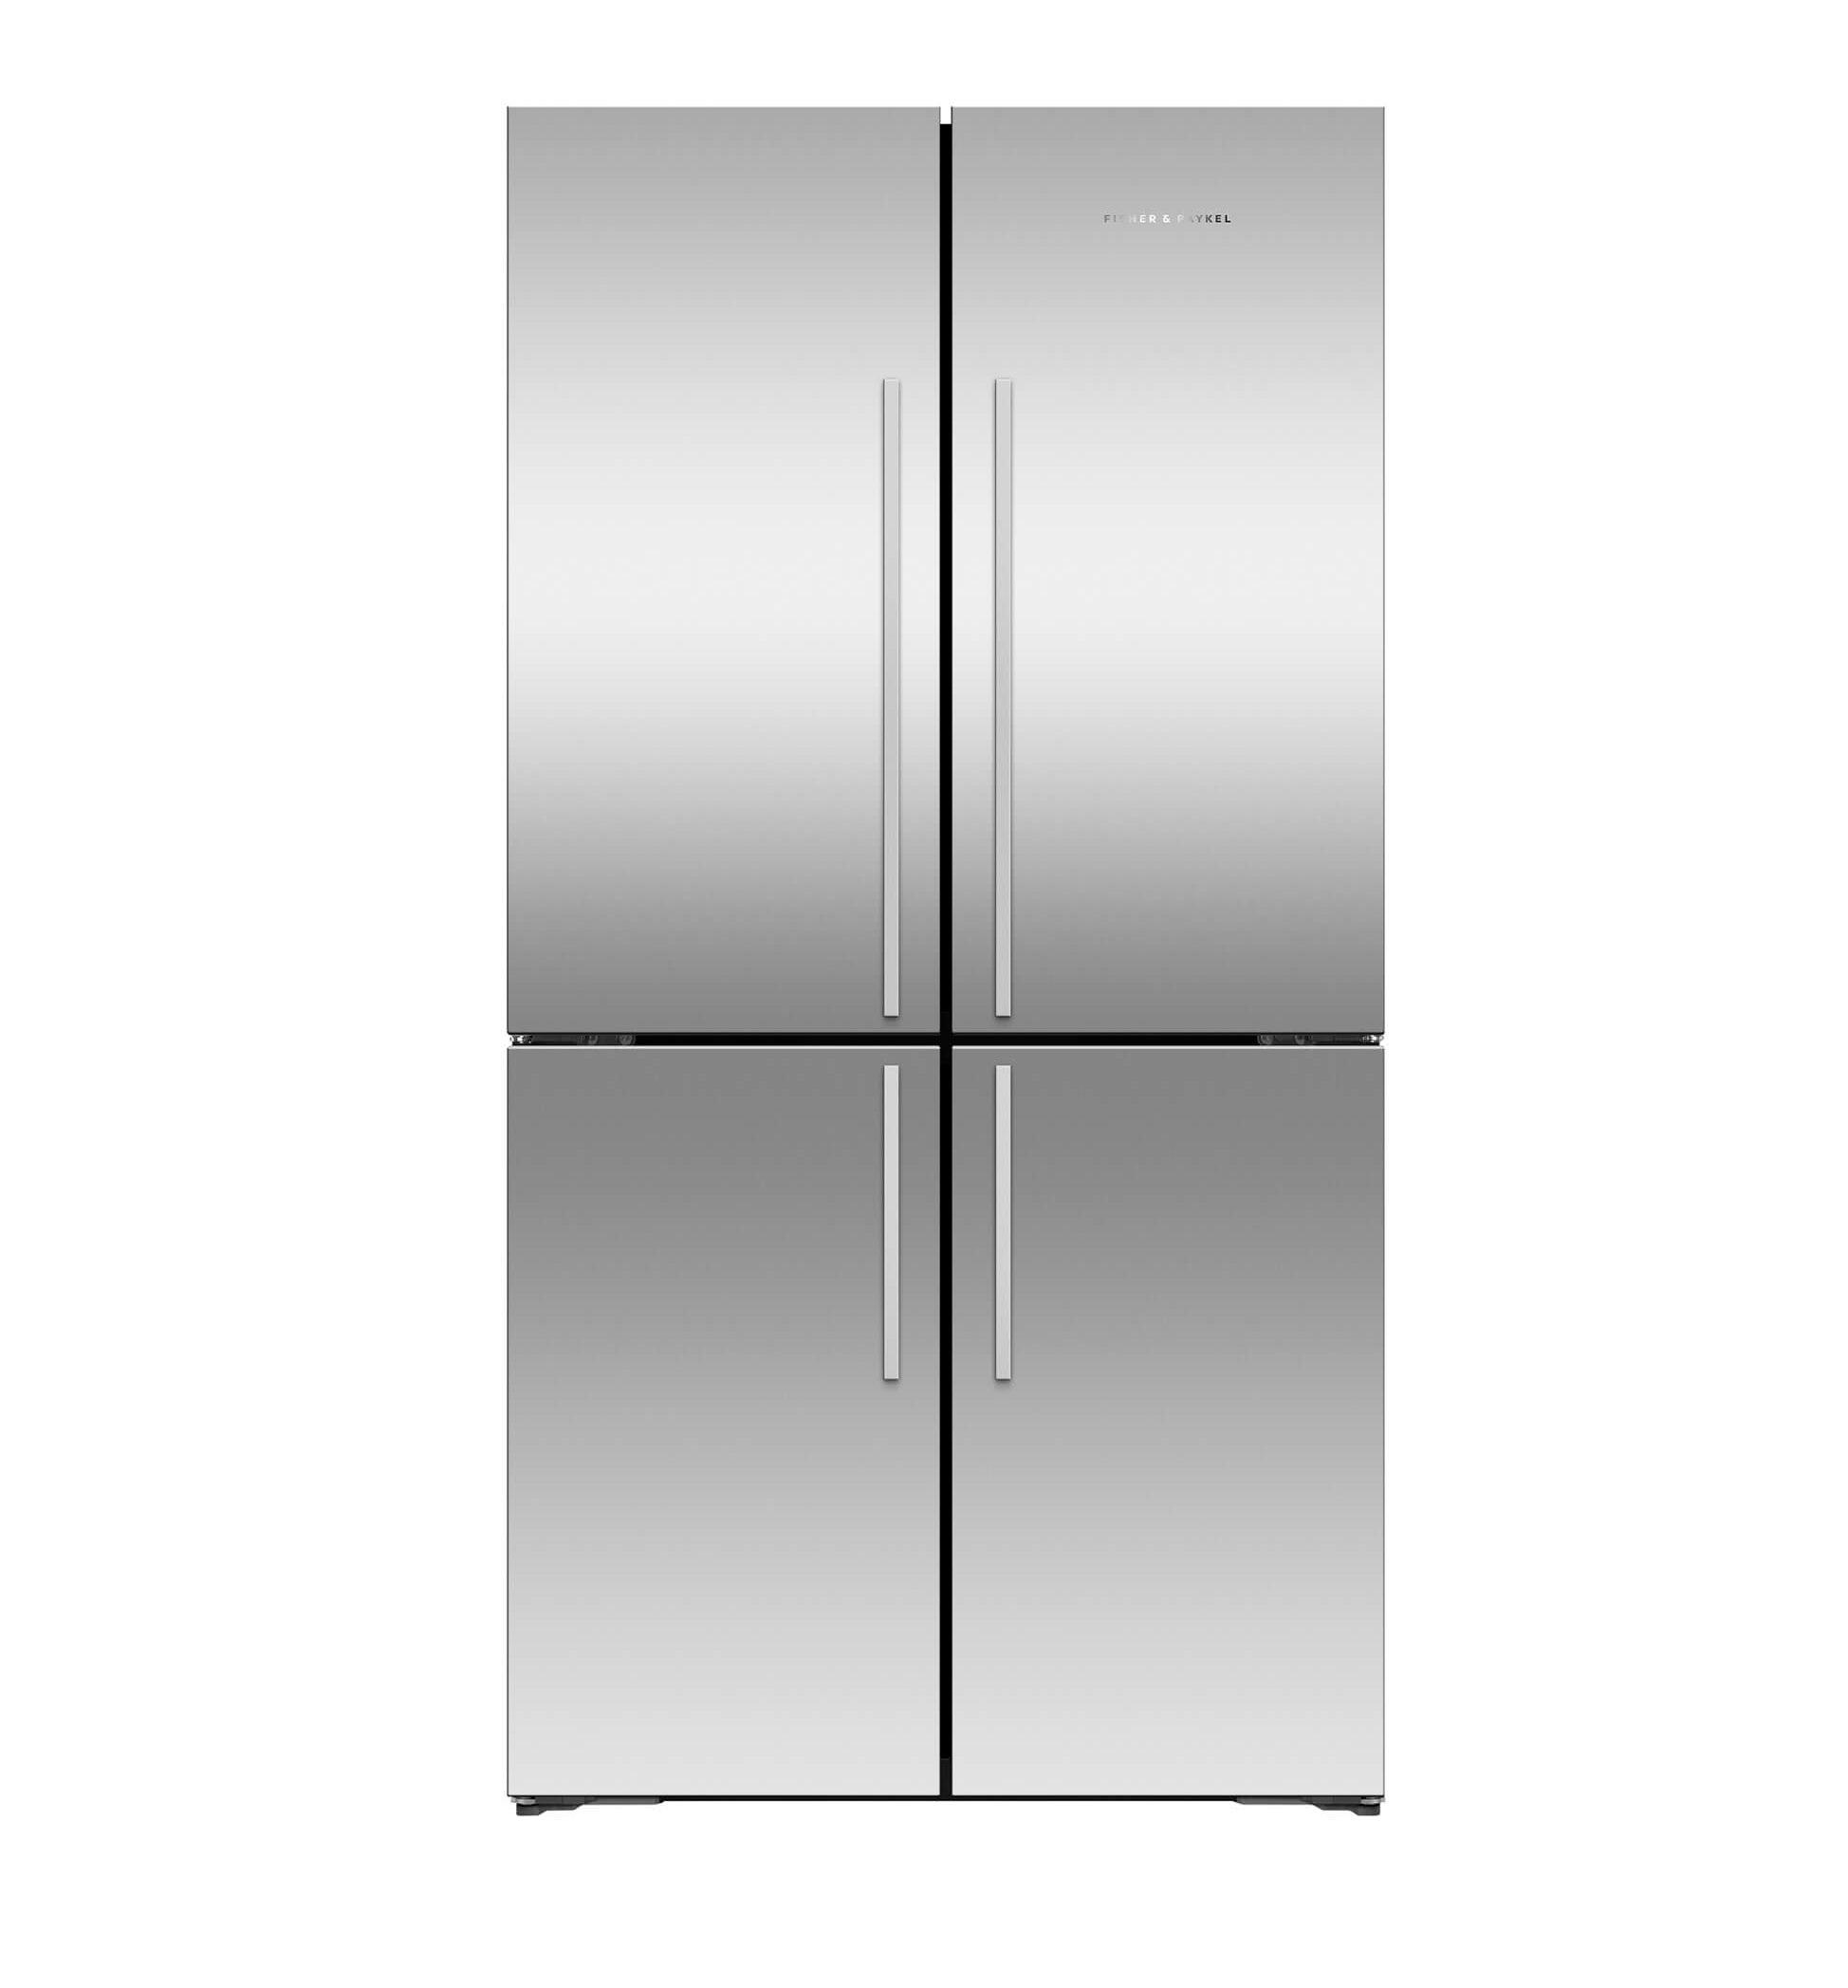 Fisher & Paykel RF605QDVX1 Refrigerator